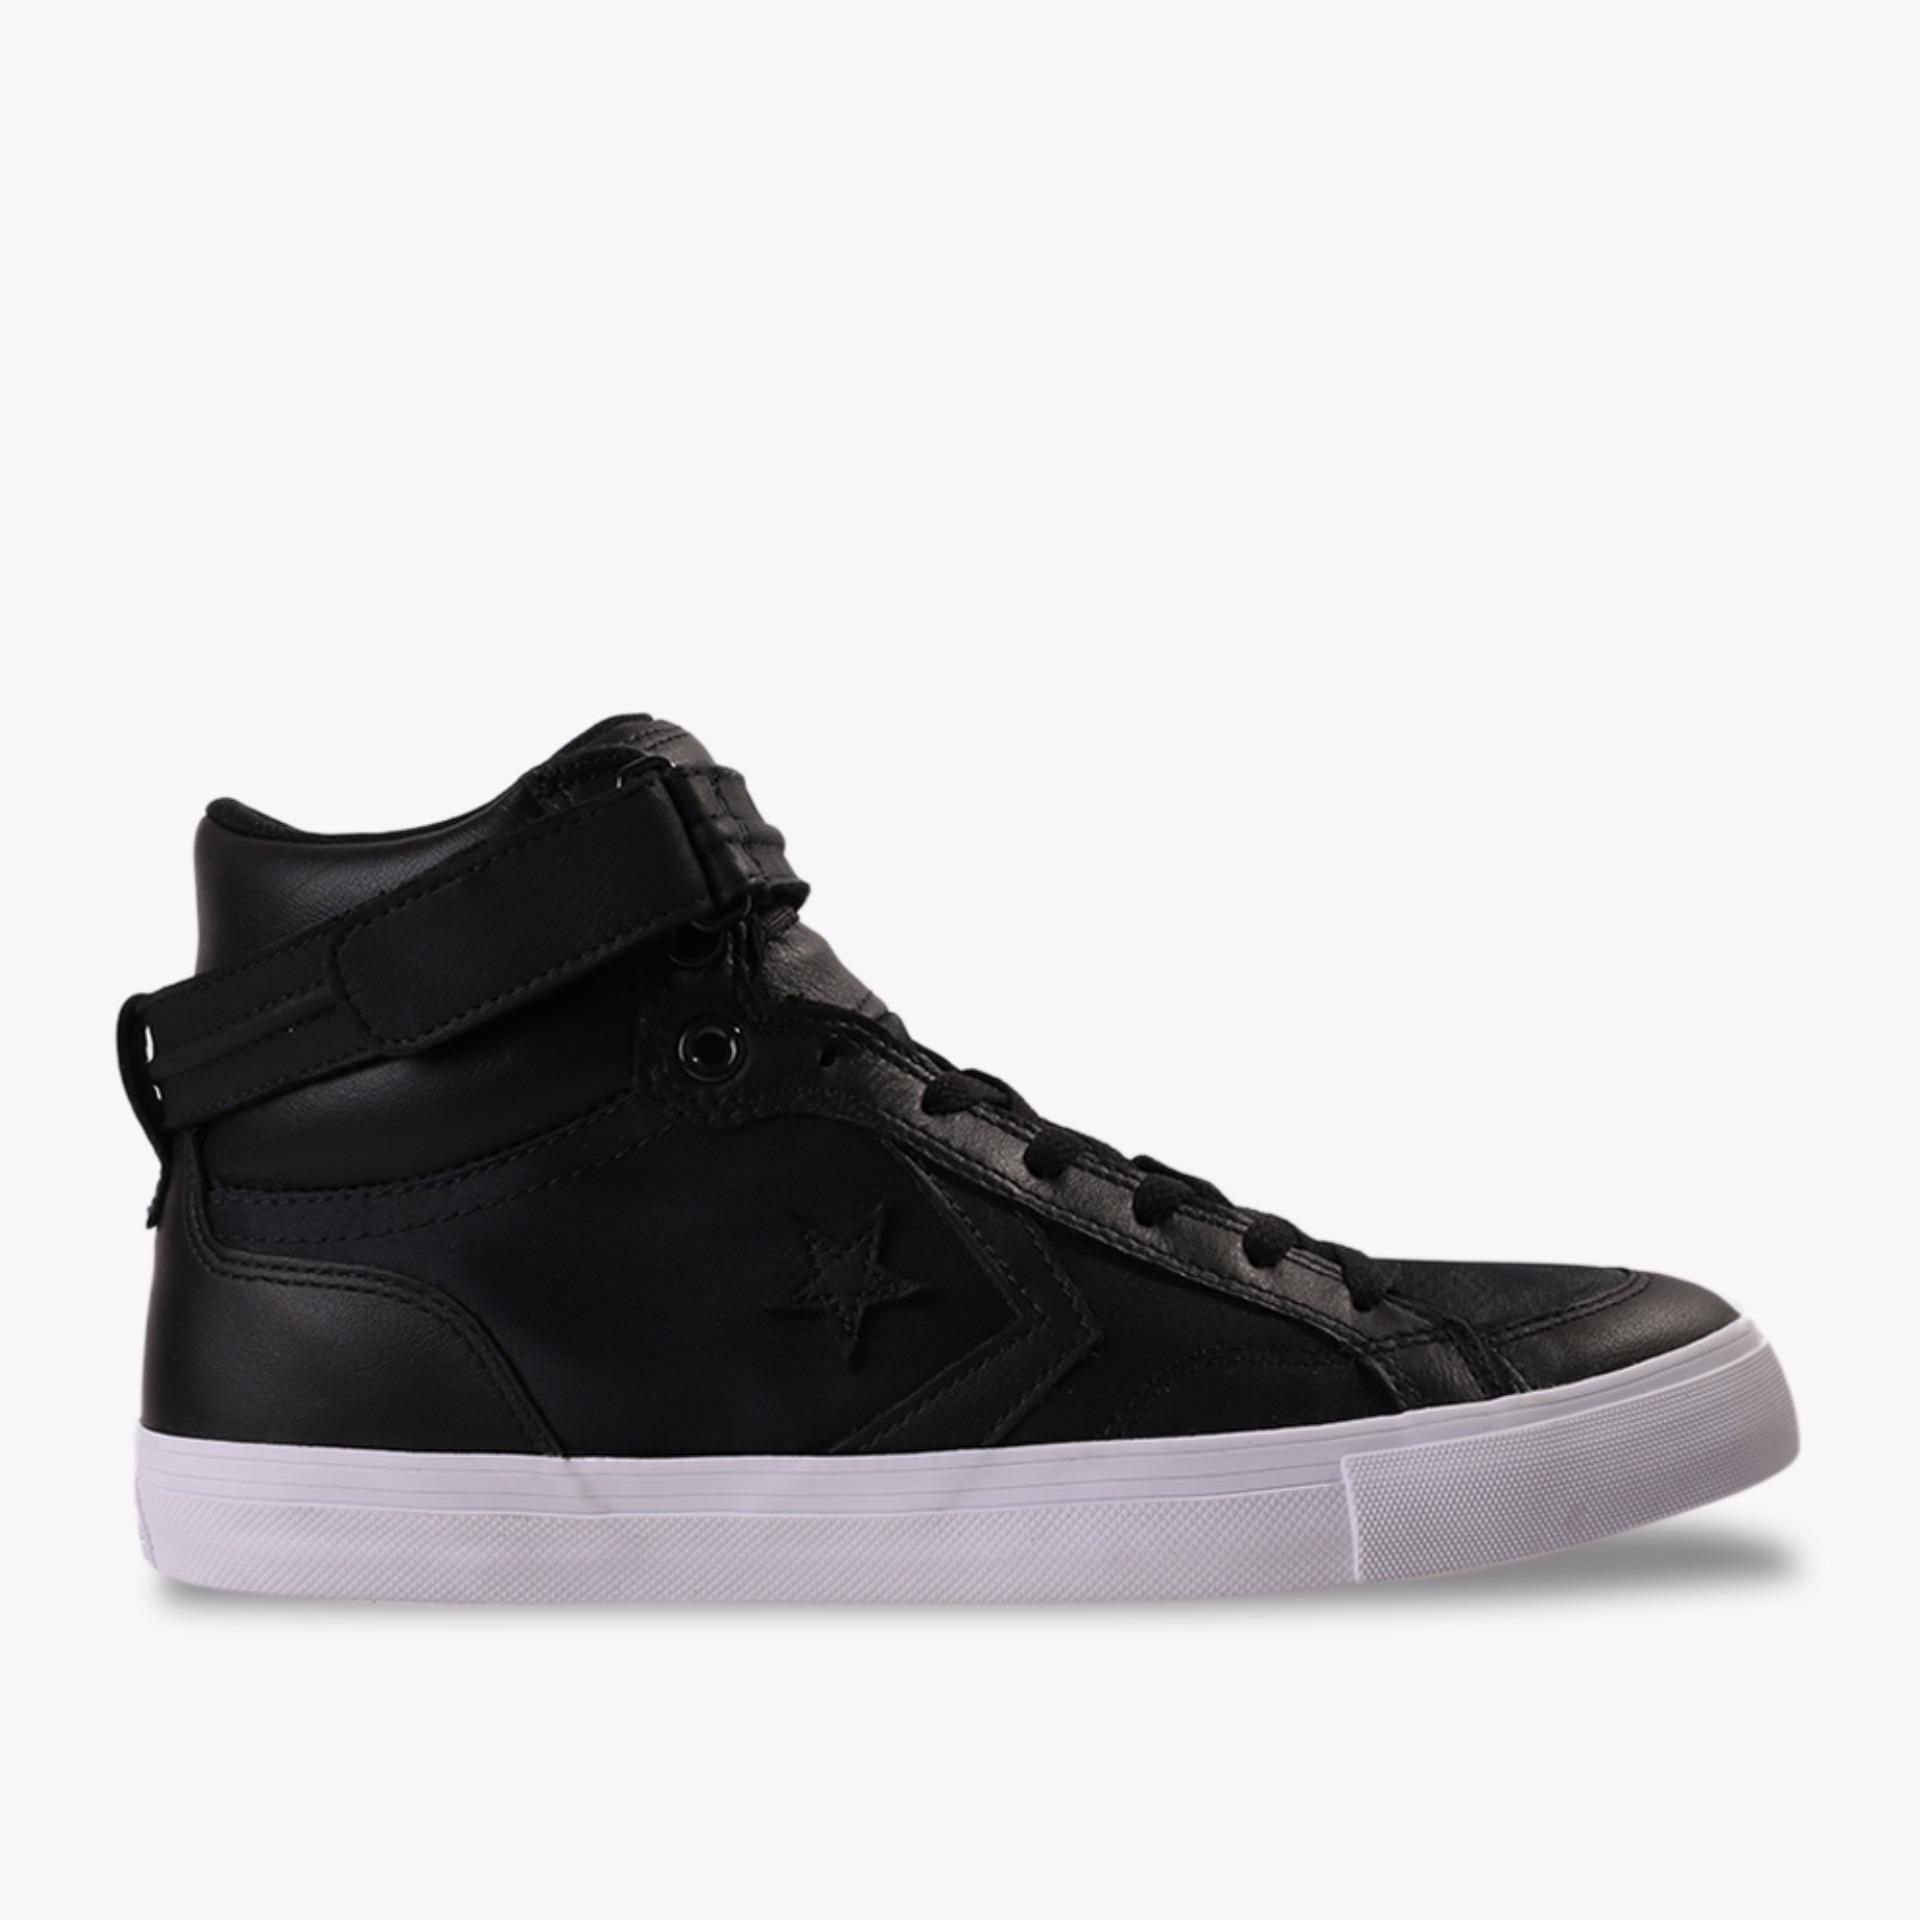 Toko Jual Converse Pro Blaze Plus Hi Men S Sneakers Shoes Hitam